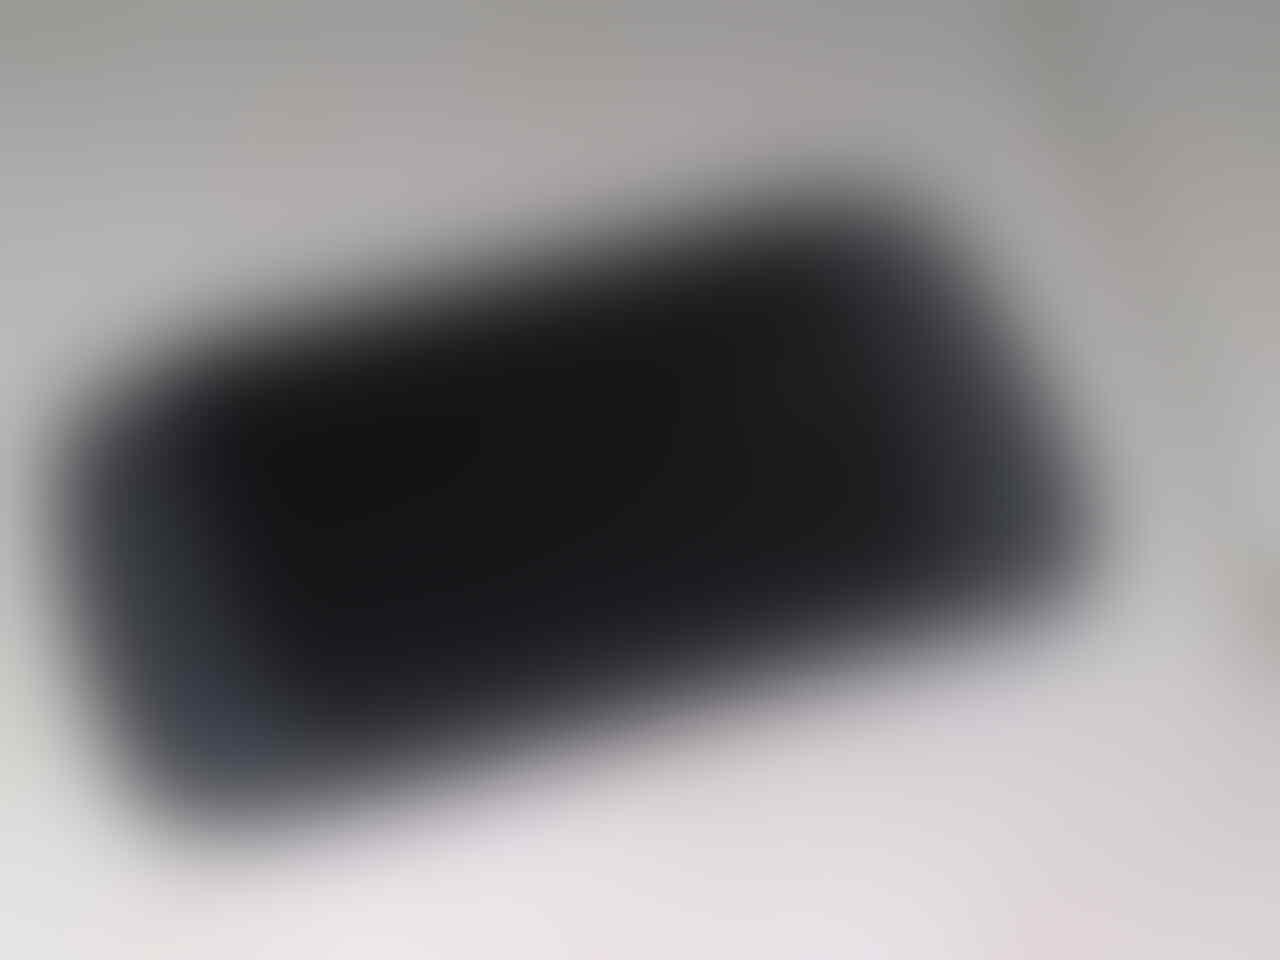 Gemini 8520 Hitam Harga murah saja Ex Berrindo Semarang